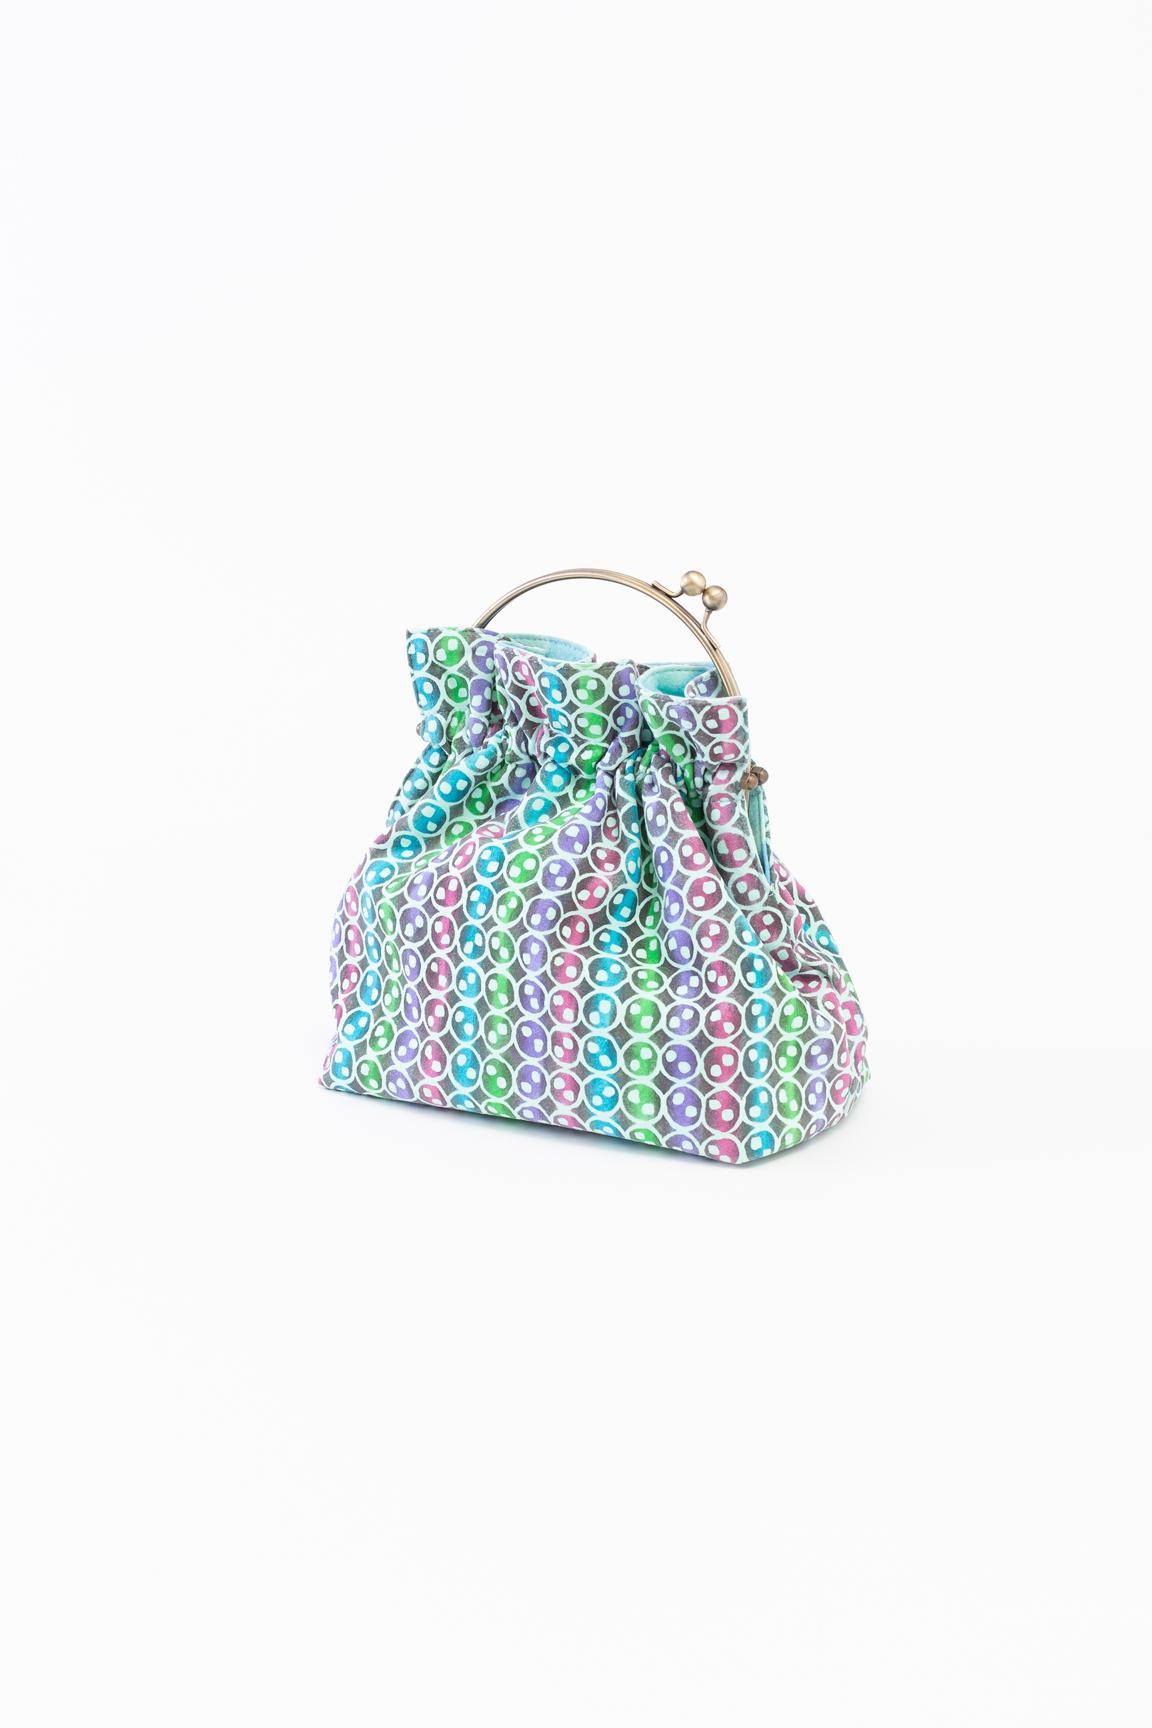 Bag(blue)